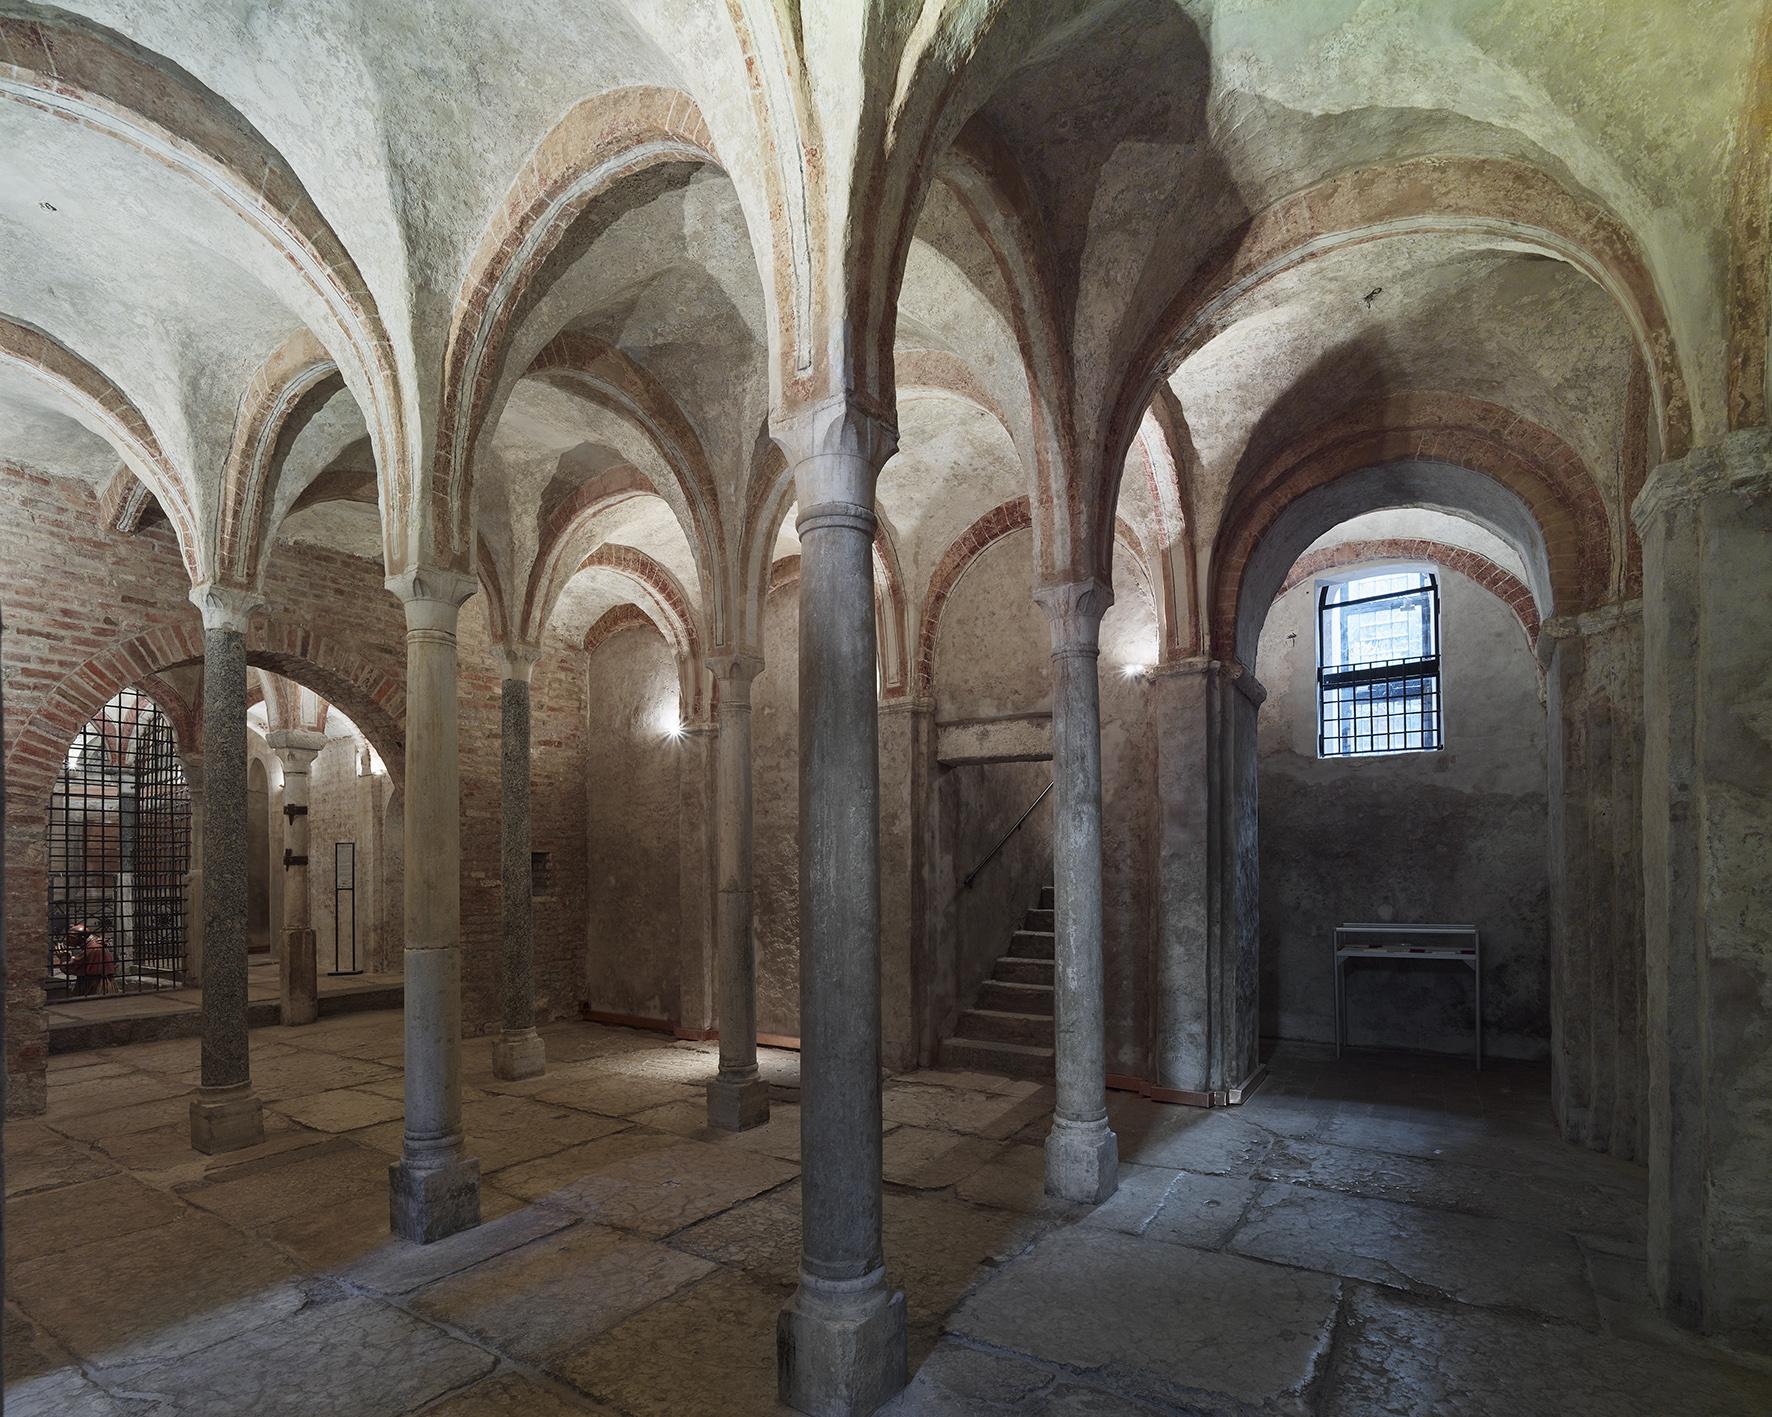 <p>La Cripta di San Sepolcro</p>